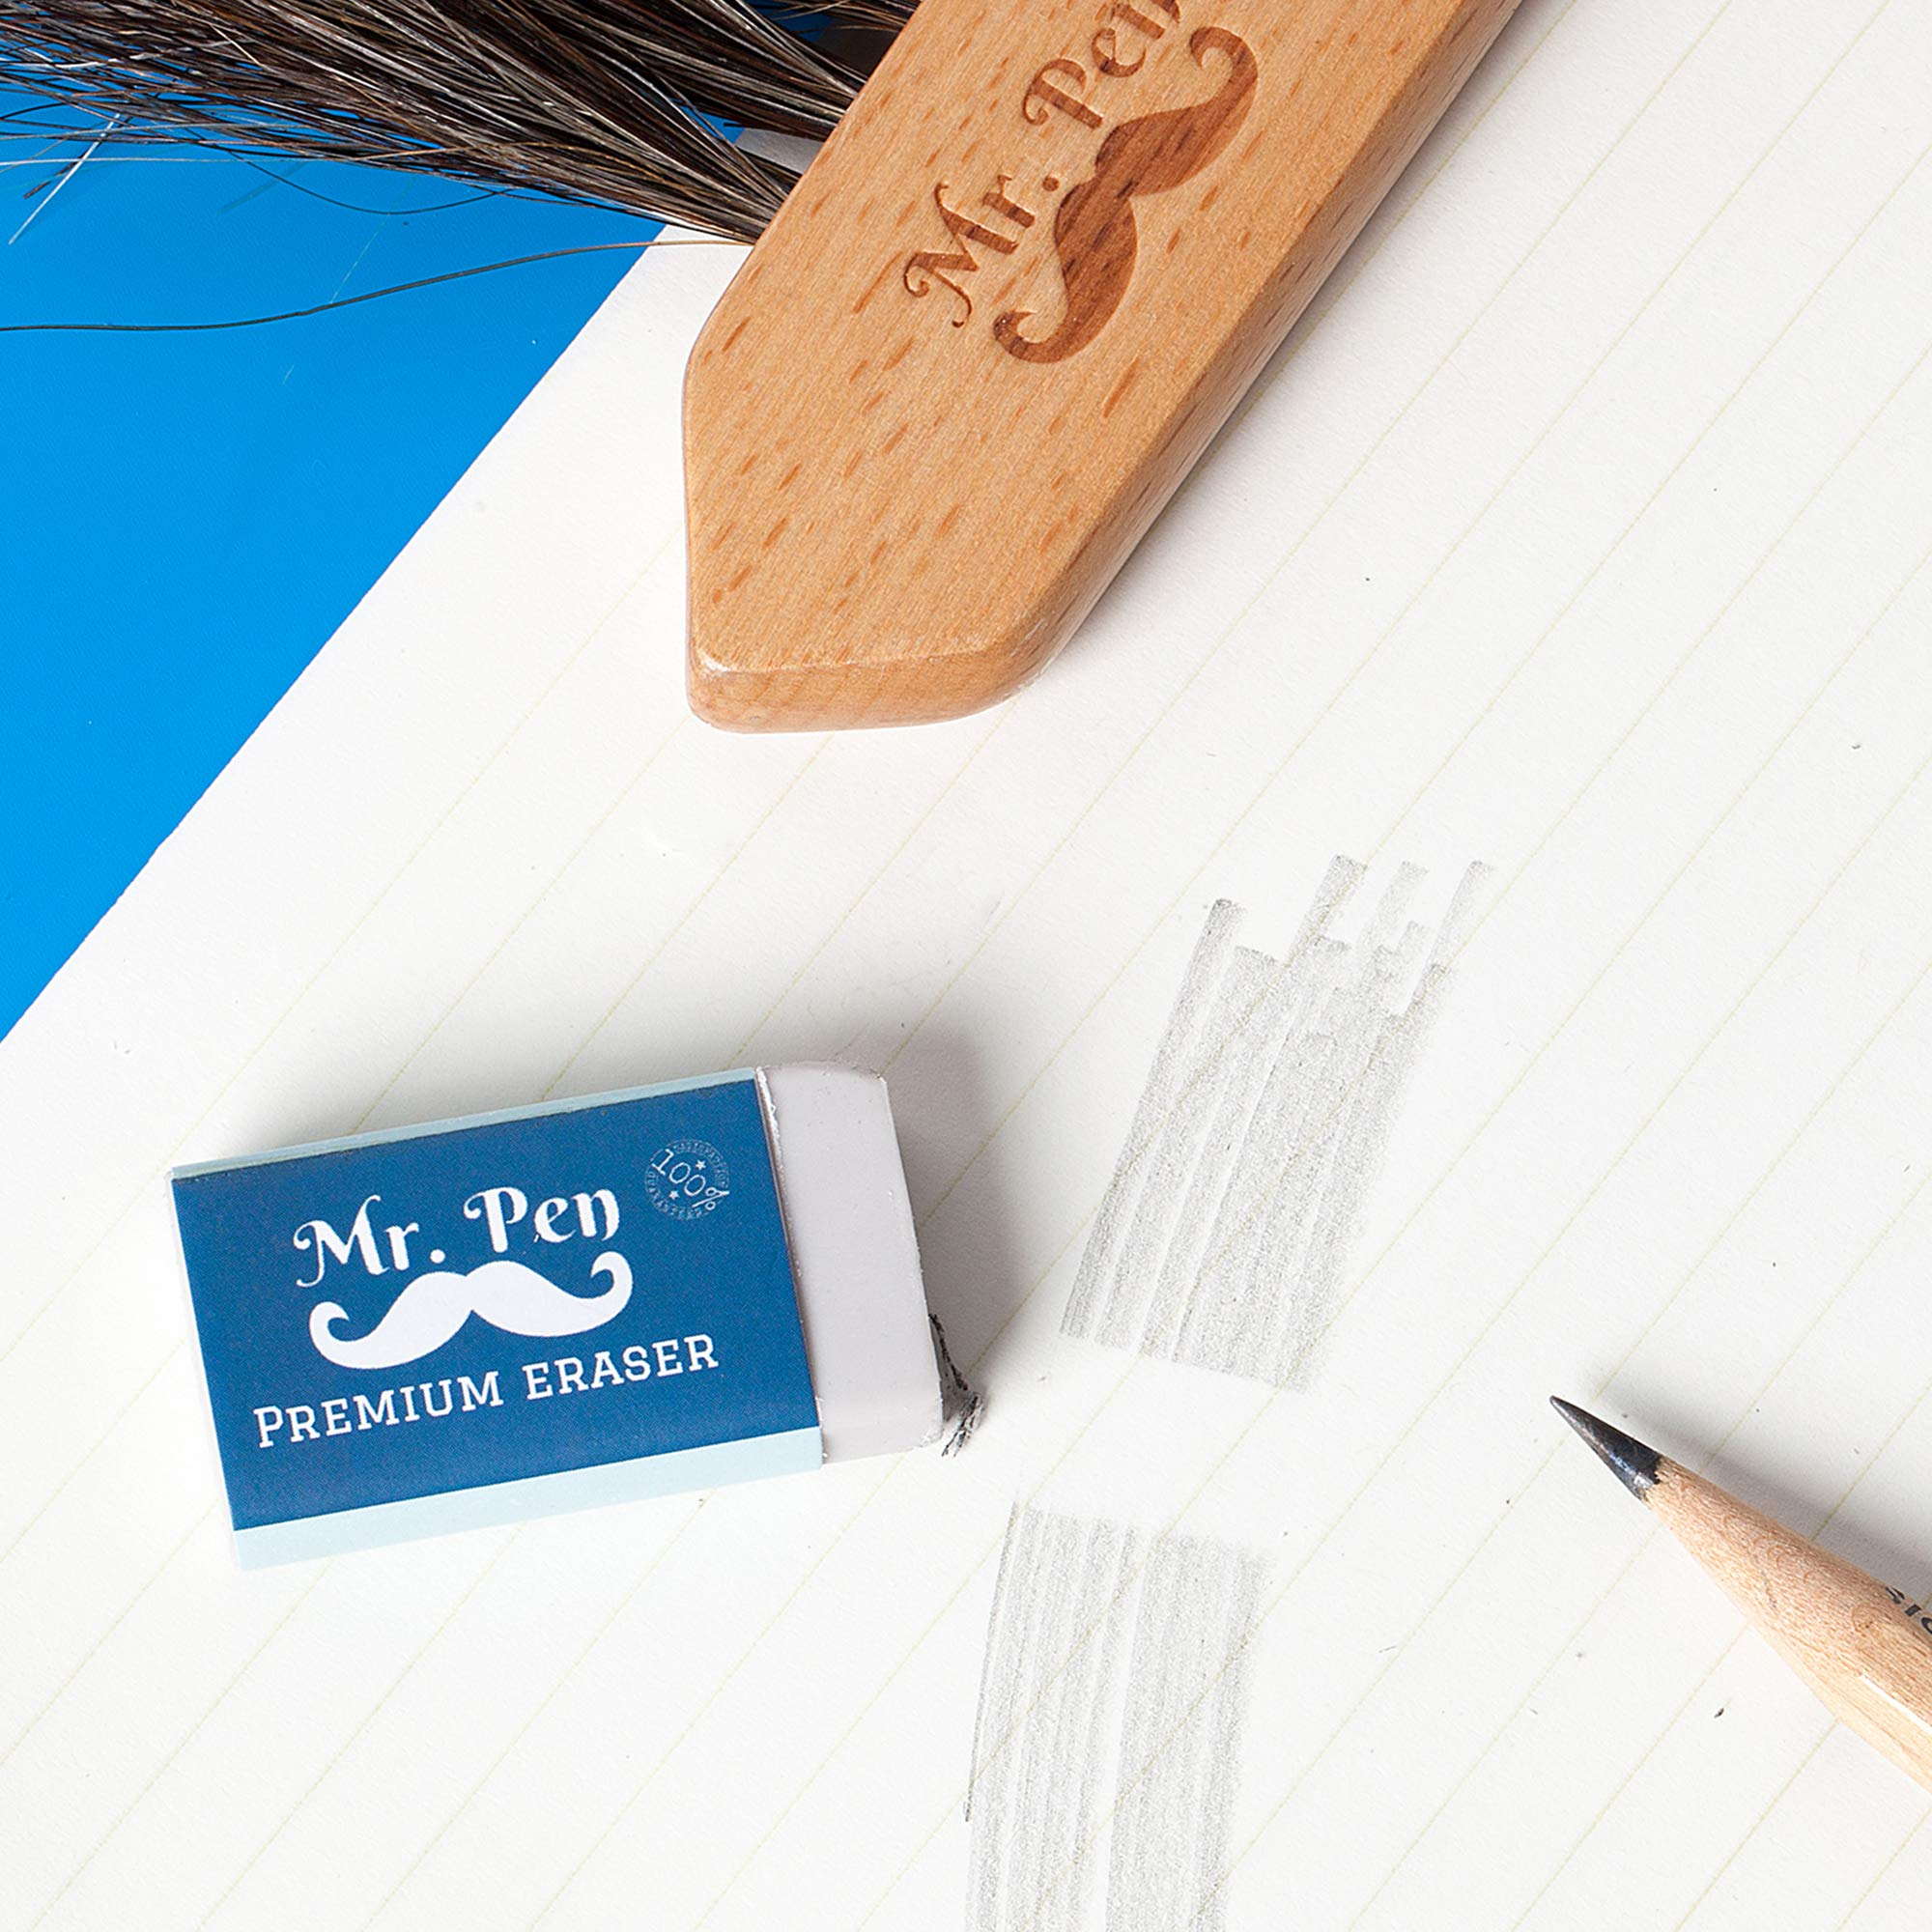 Mr. Pen- Erasers, Pack of 24, Premium Eraser, Pencil Erasers, White Eraser, School Supplies, Eraser Pencil for Artists and Students, Erasers for Kids, Art Eraser, Erasers Bulk, Eraser for School by Mr. Pen (Image #3)